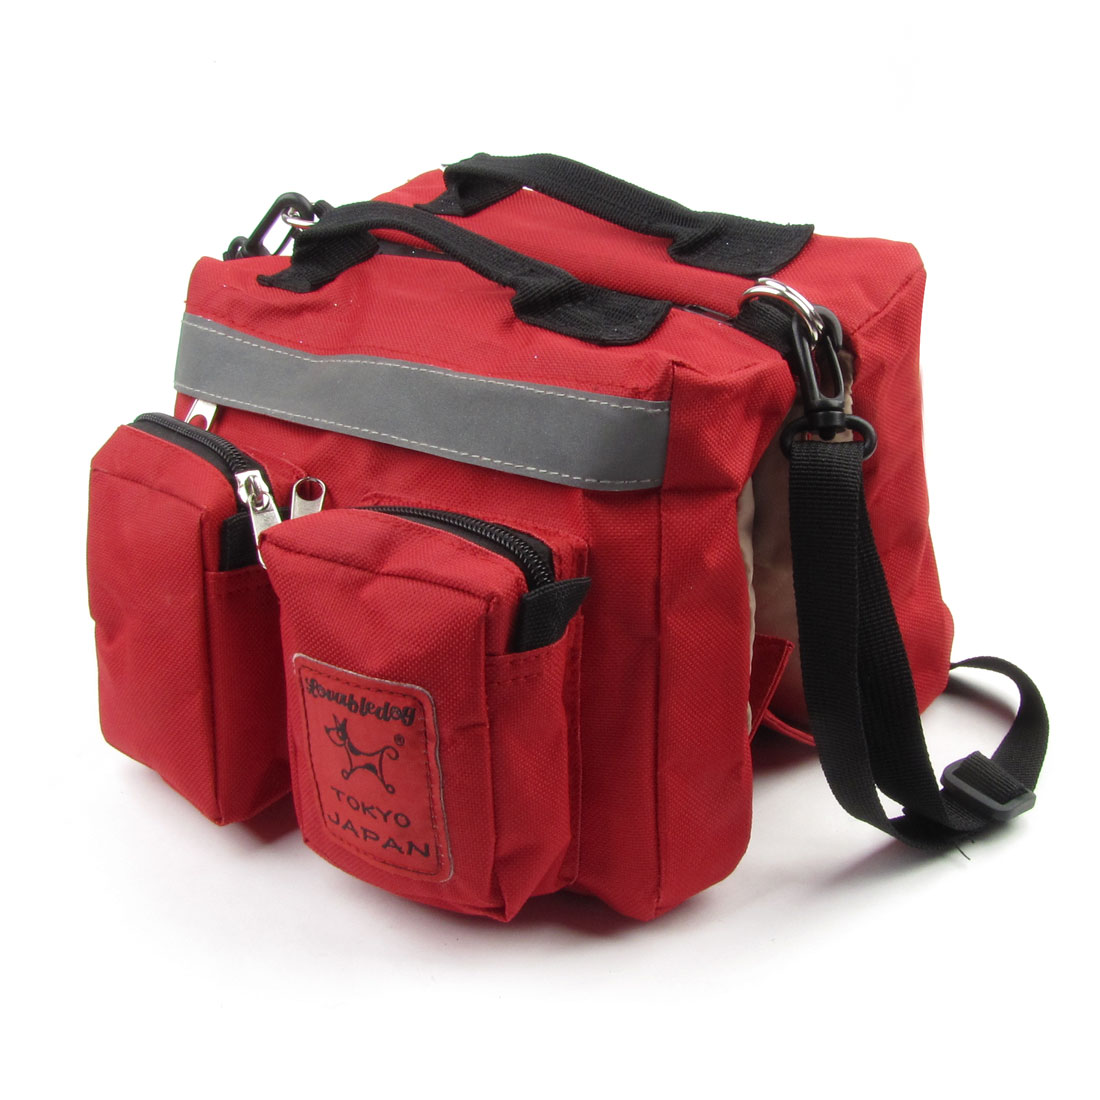 Casual Traveling Nylon Pet Dog Cat Backpack Knapsack Saddlebag Size L